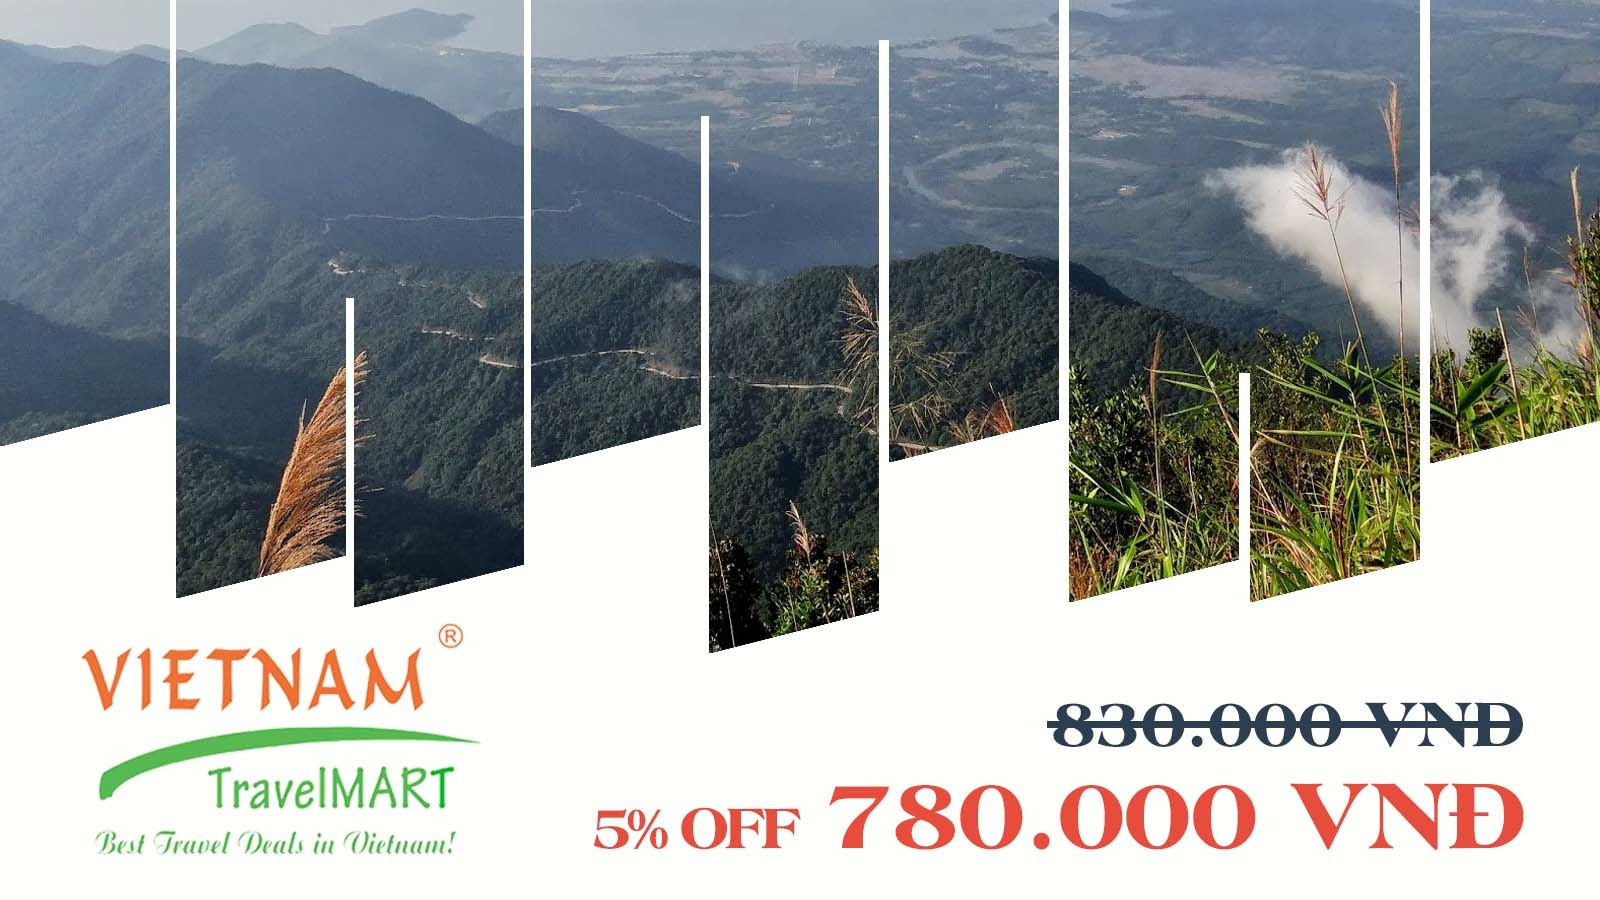 VIETNAM TRAVELMART JSC   5% OFF BACH MA NATIONAL PARK DAILY TOUR